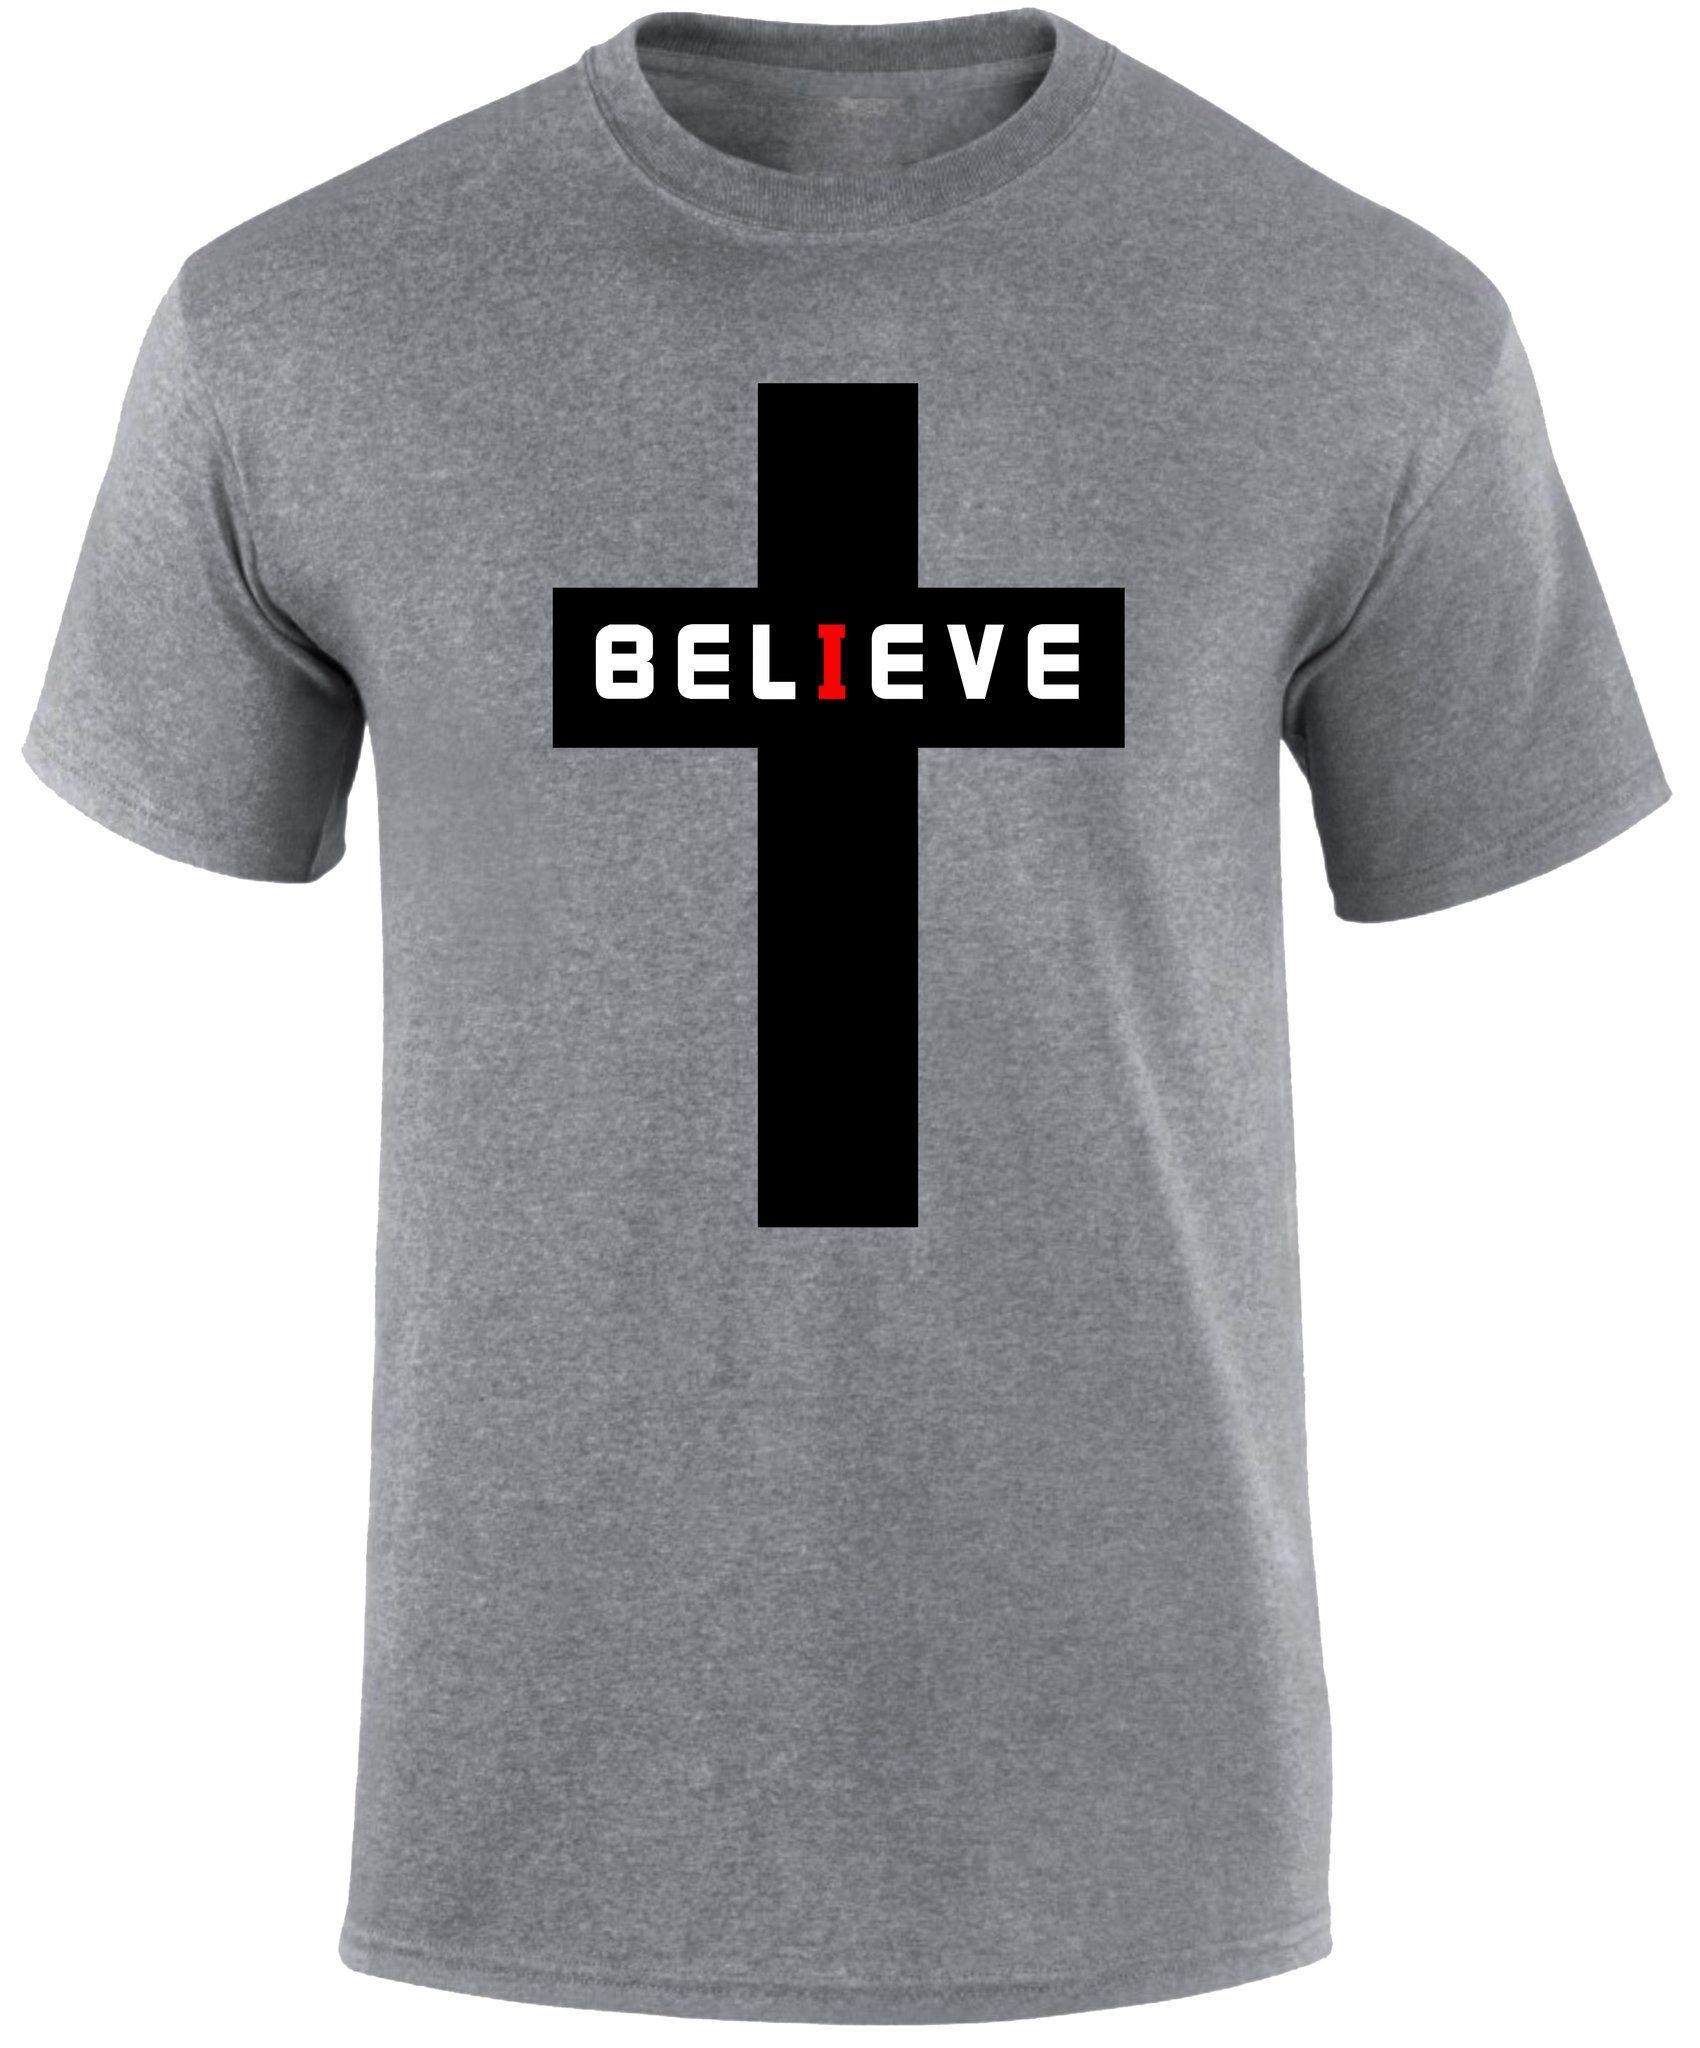 Believe Chrisitan Cross Scripture Religious T Shirt Superpraisechristian Bible Scripture